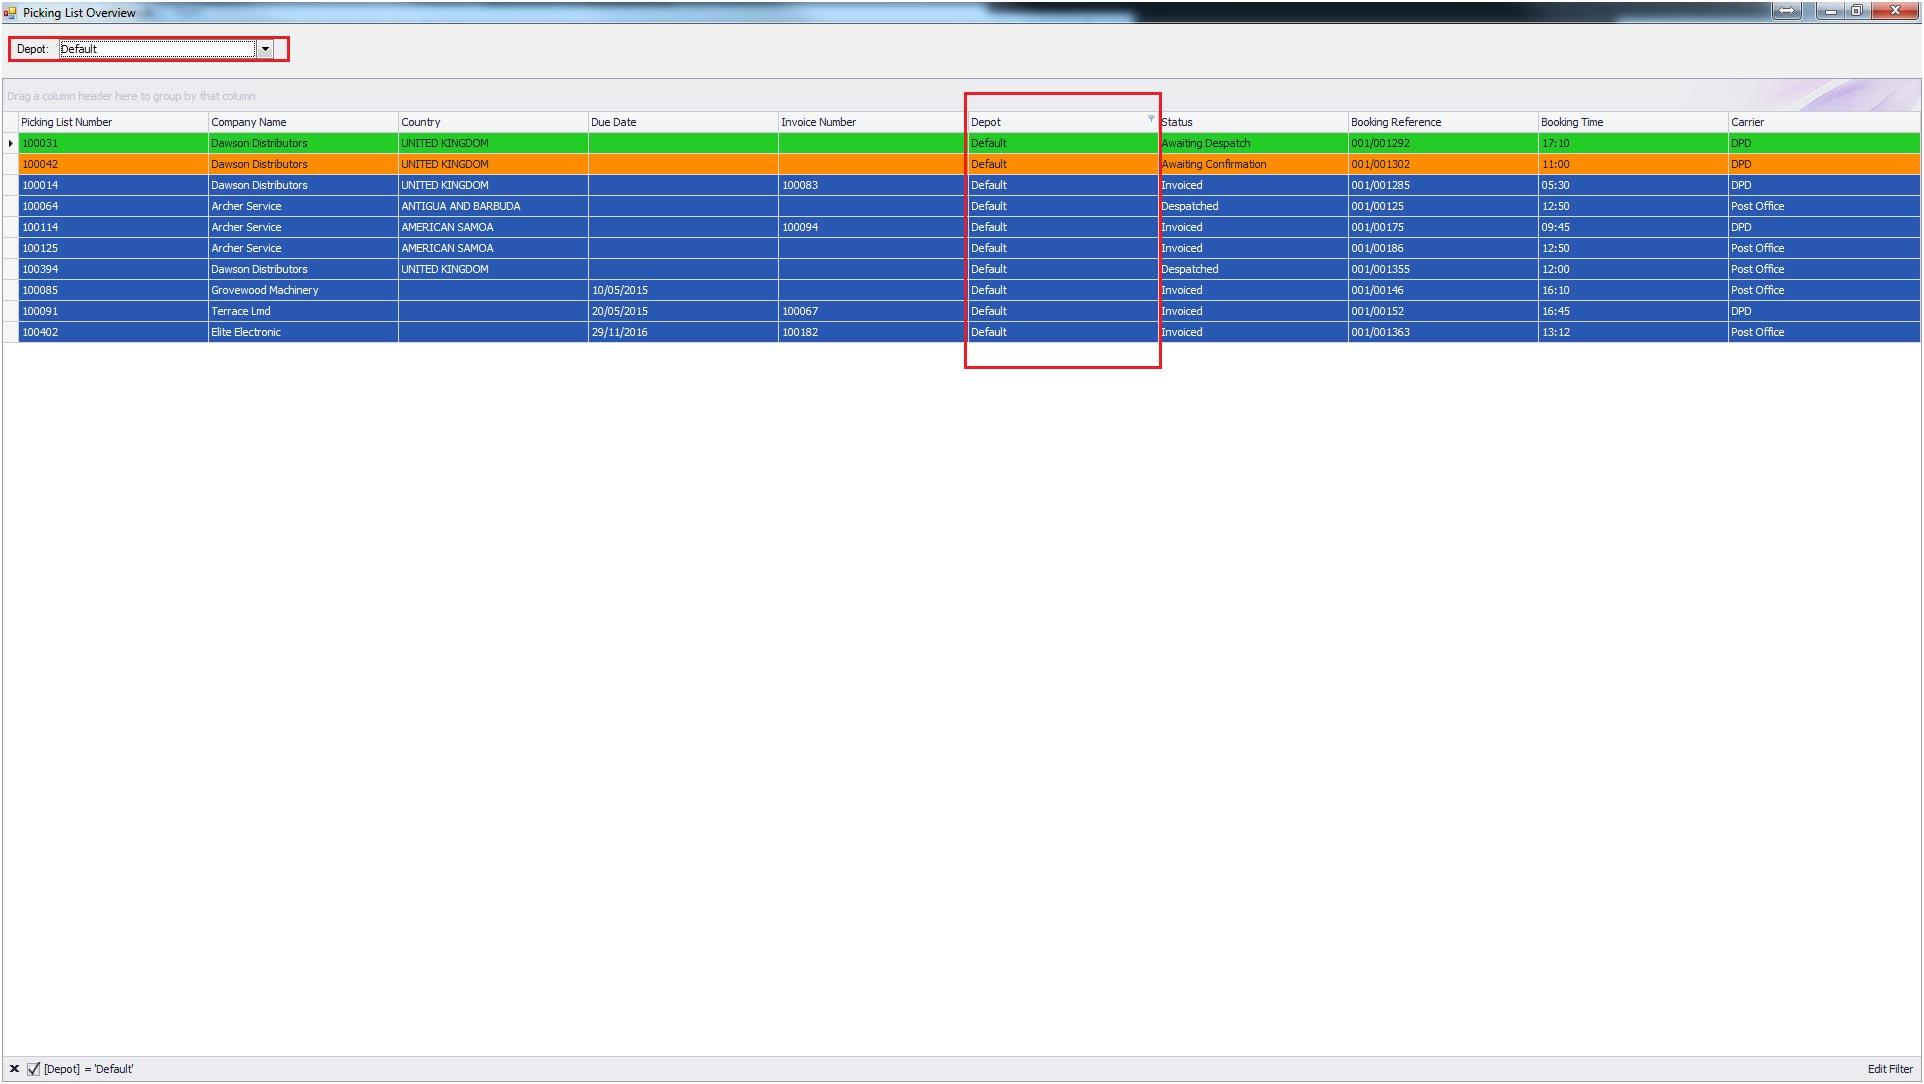 Sapman v12 Picking List Overview screen